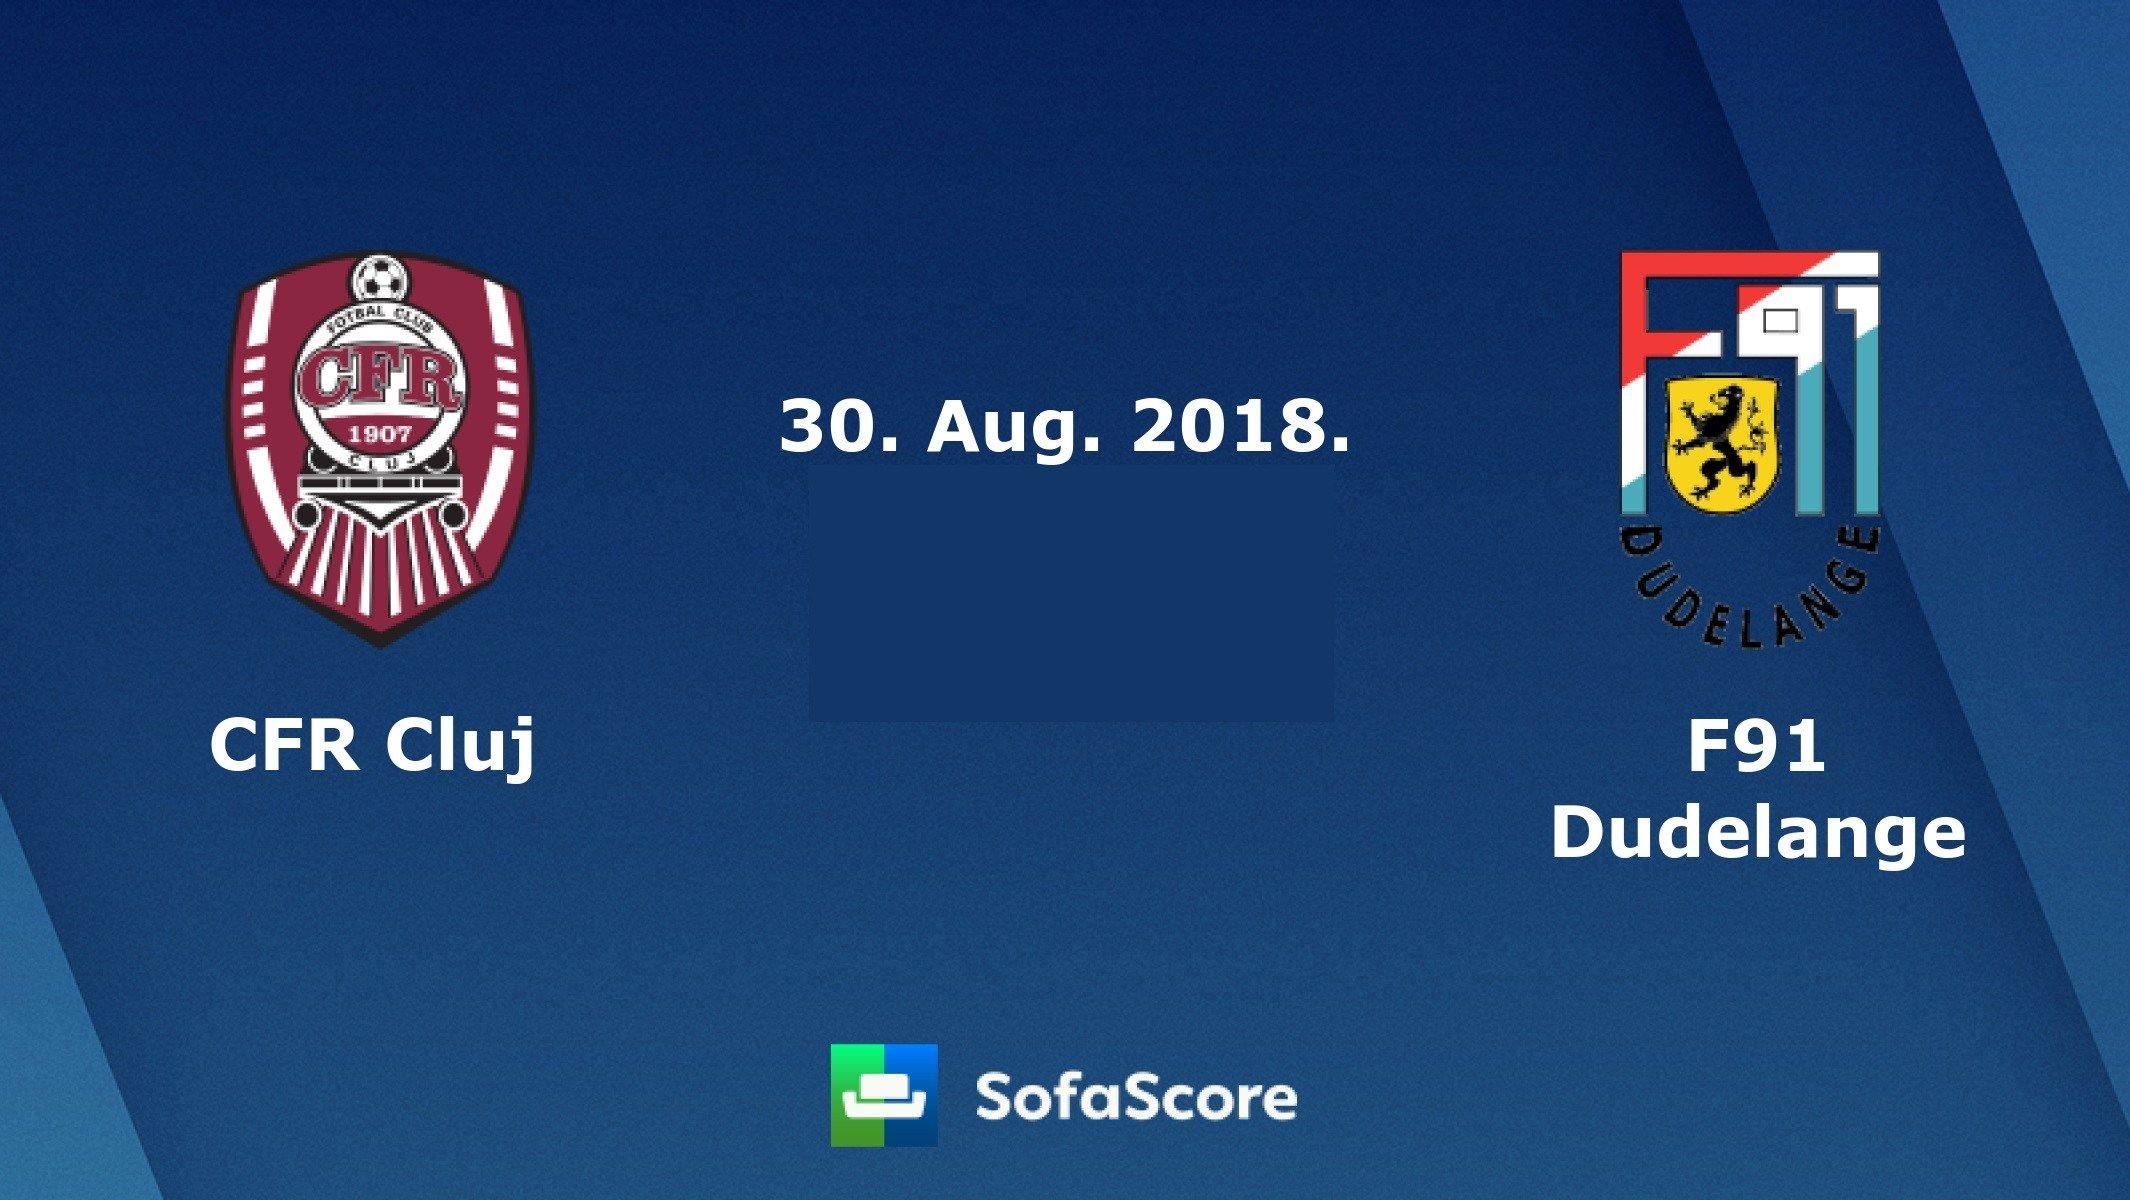 CFR Cluj vs Dudelange Live Stream Online 30.08.2018